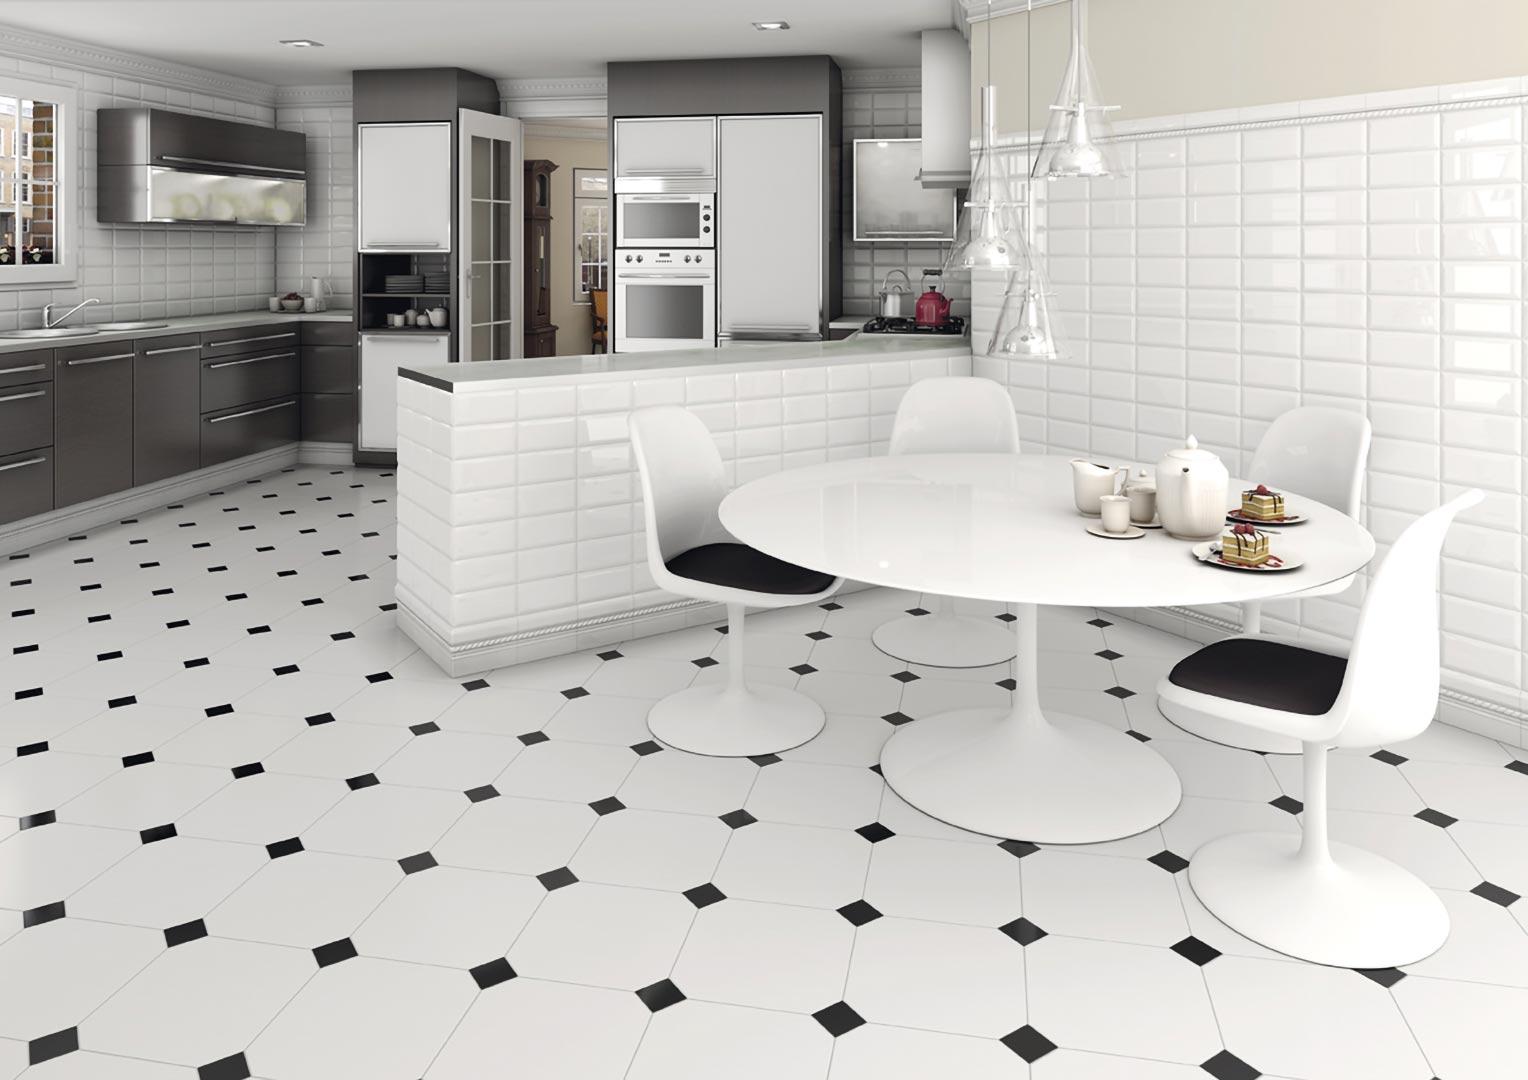 Vives floor tiles gres monocolor 14x28 floor tiles gres bb iso 13006 h doublecrazyfo Image collections